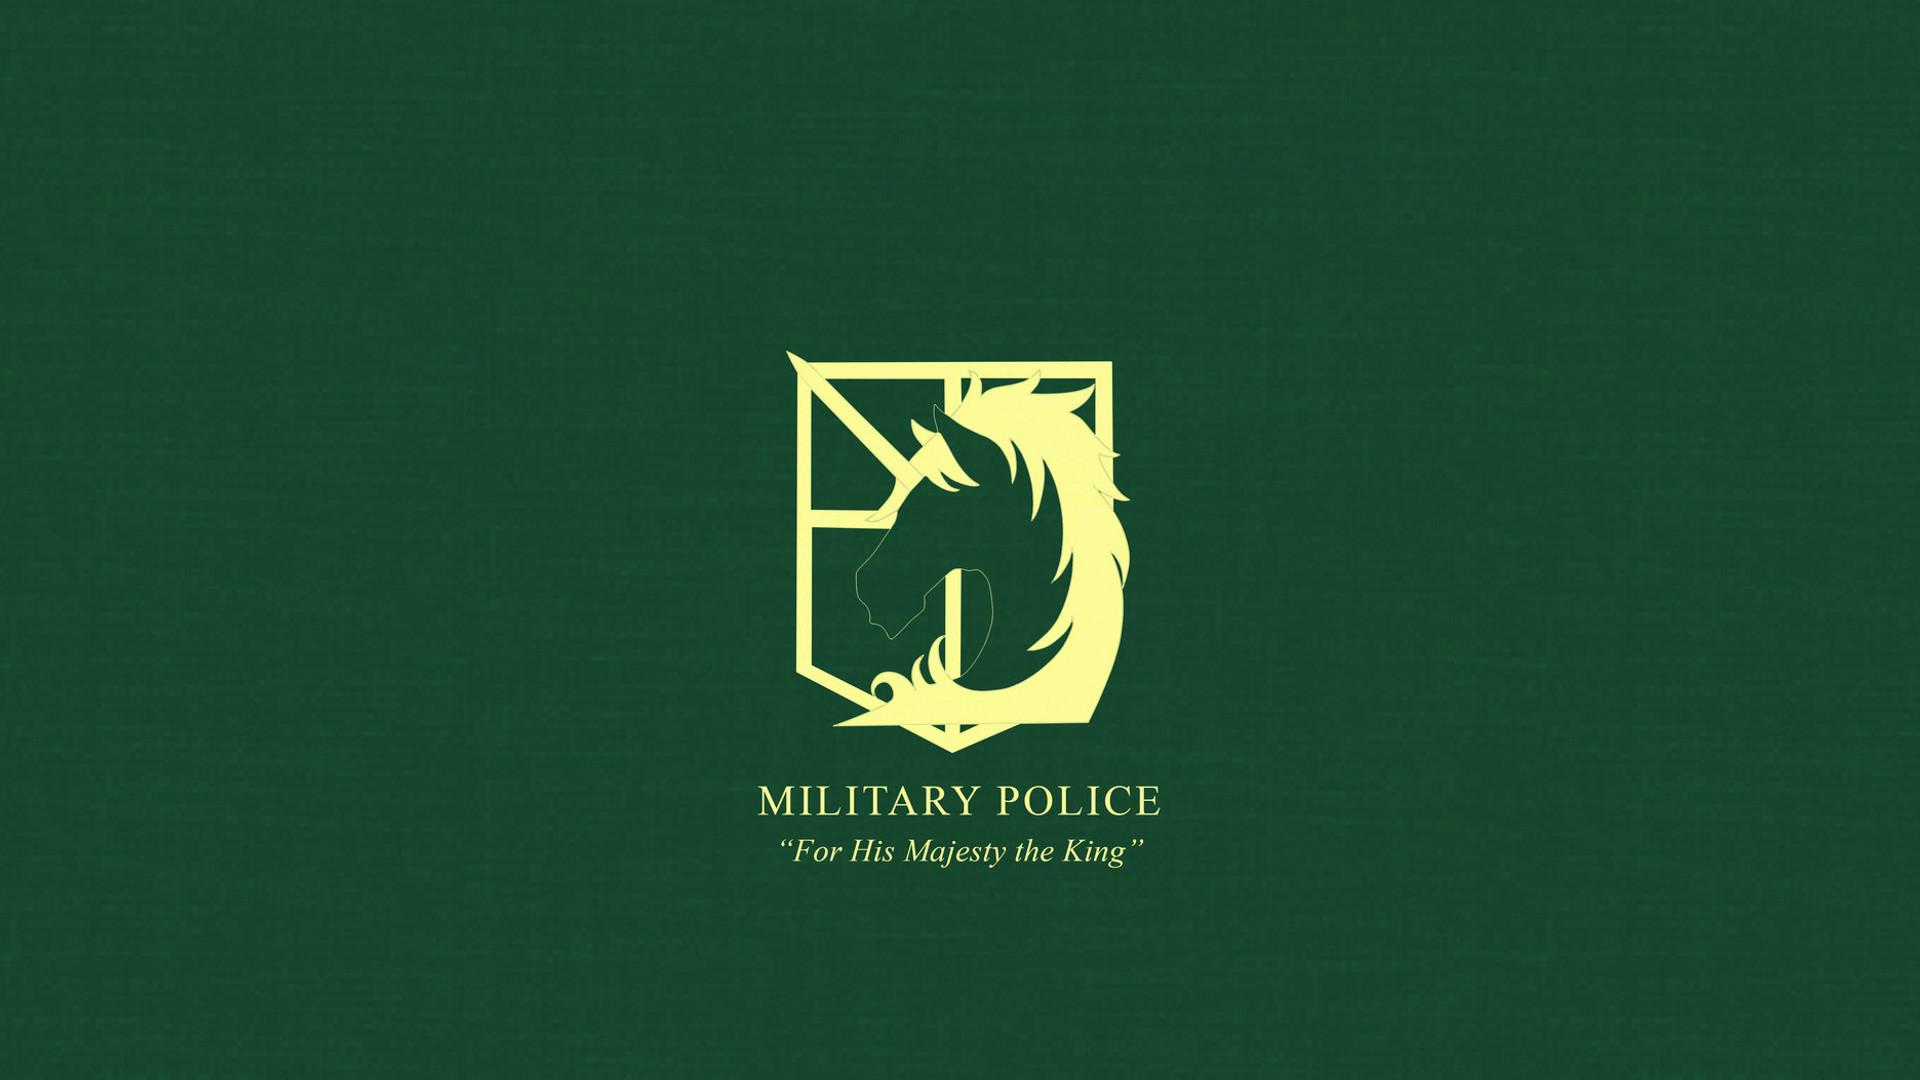 … Attack on Titan Military Police Wallpaper by Imxset21